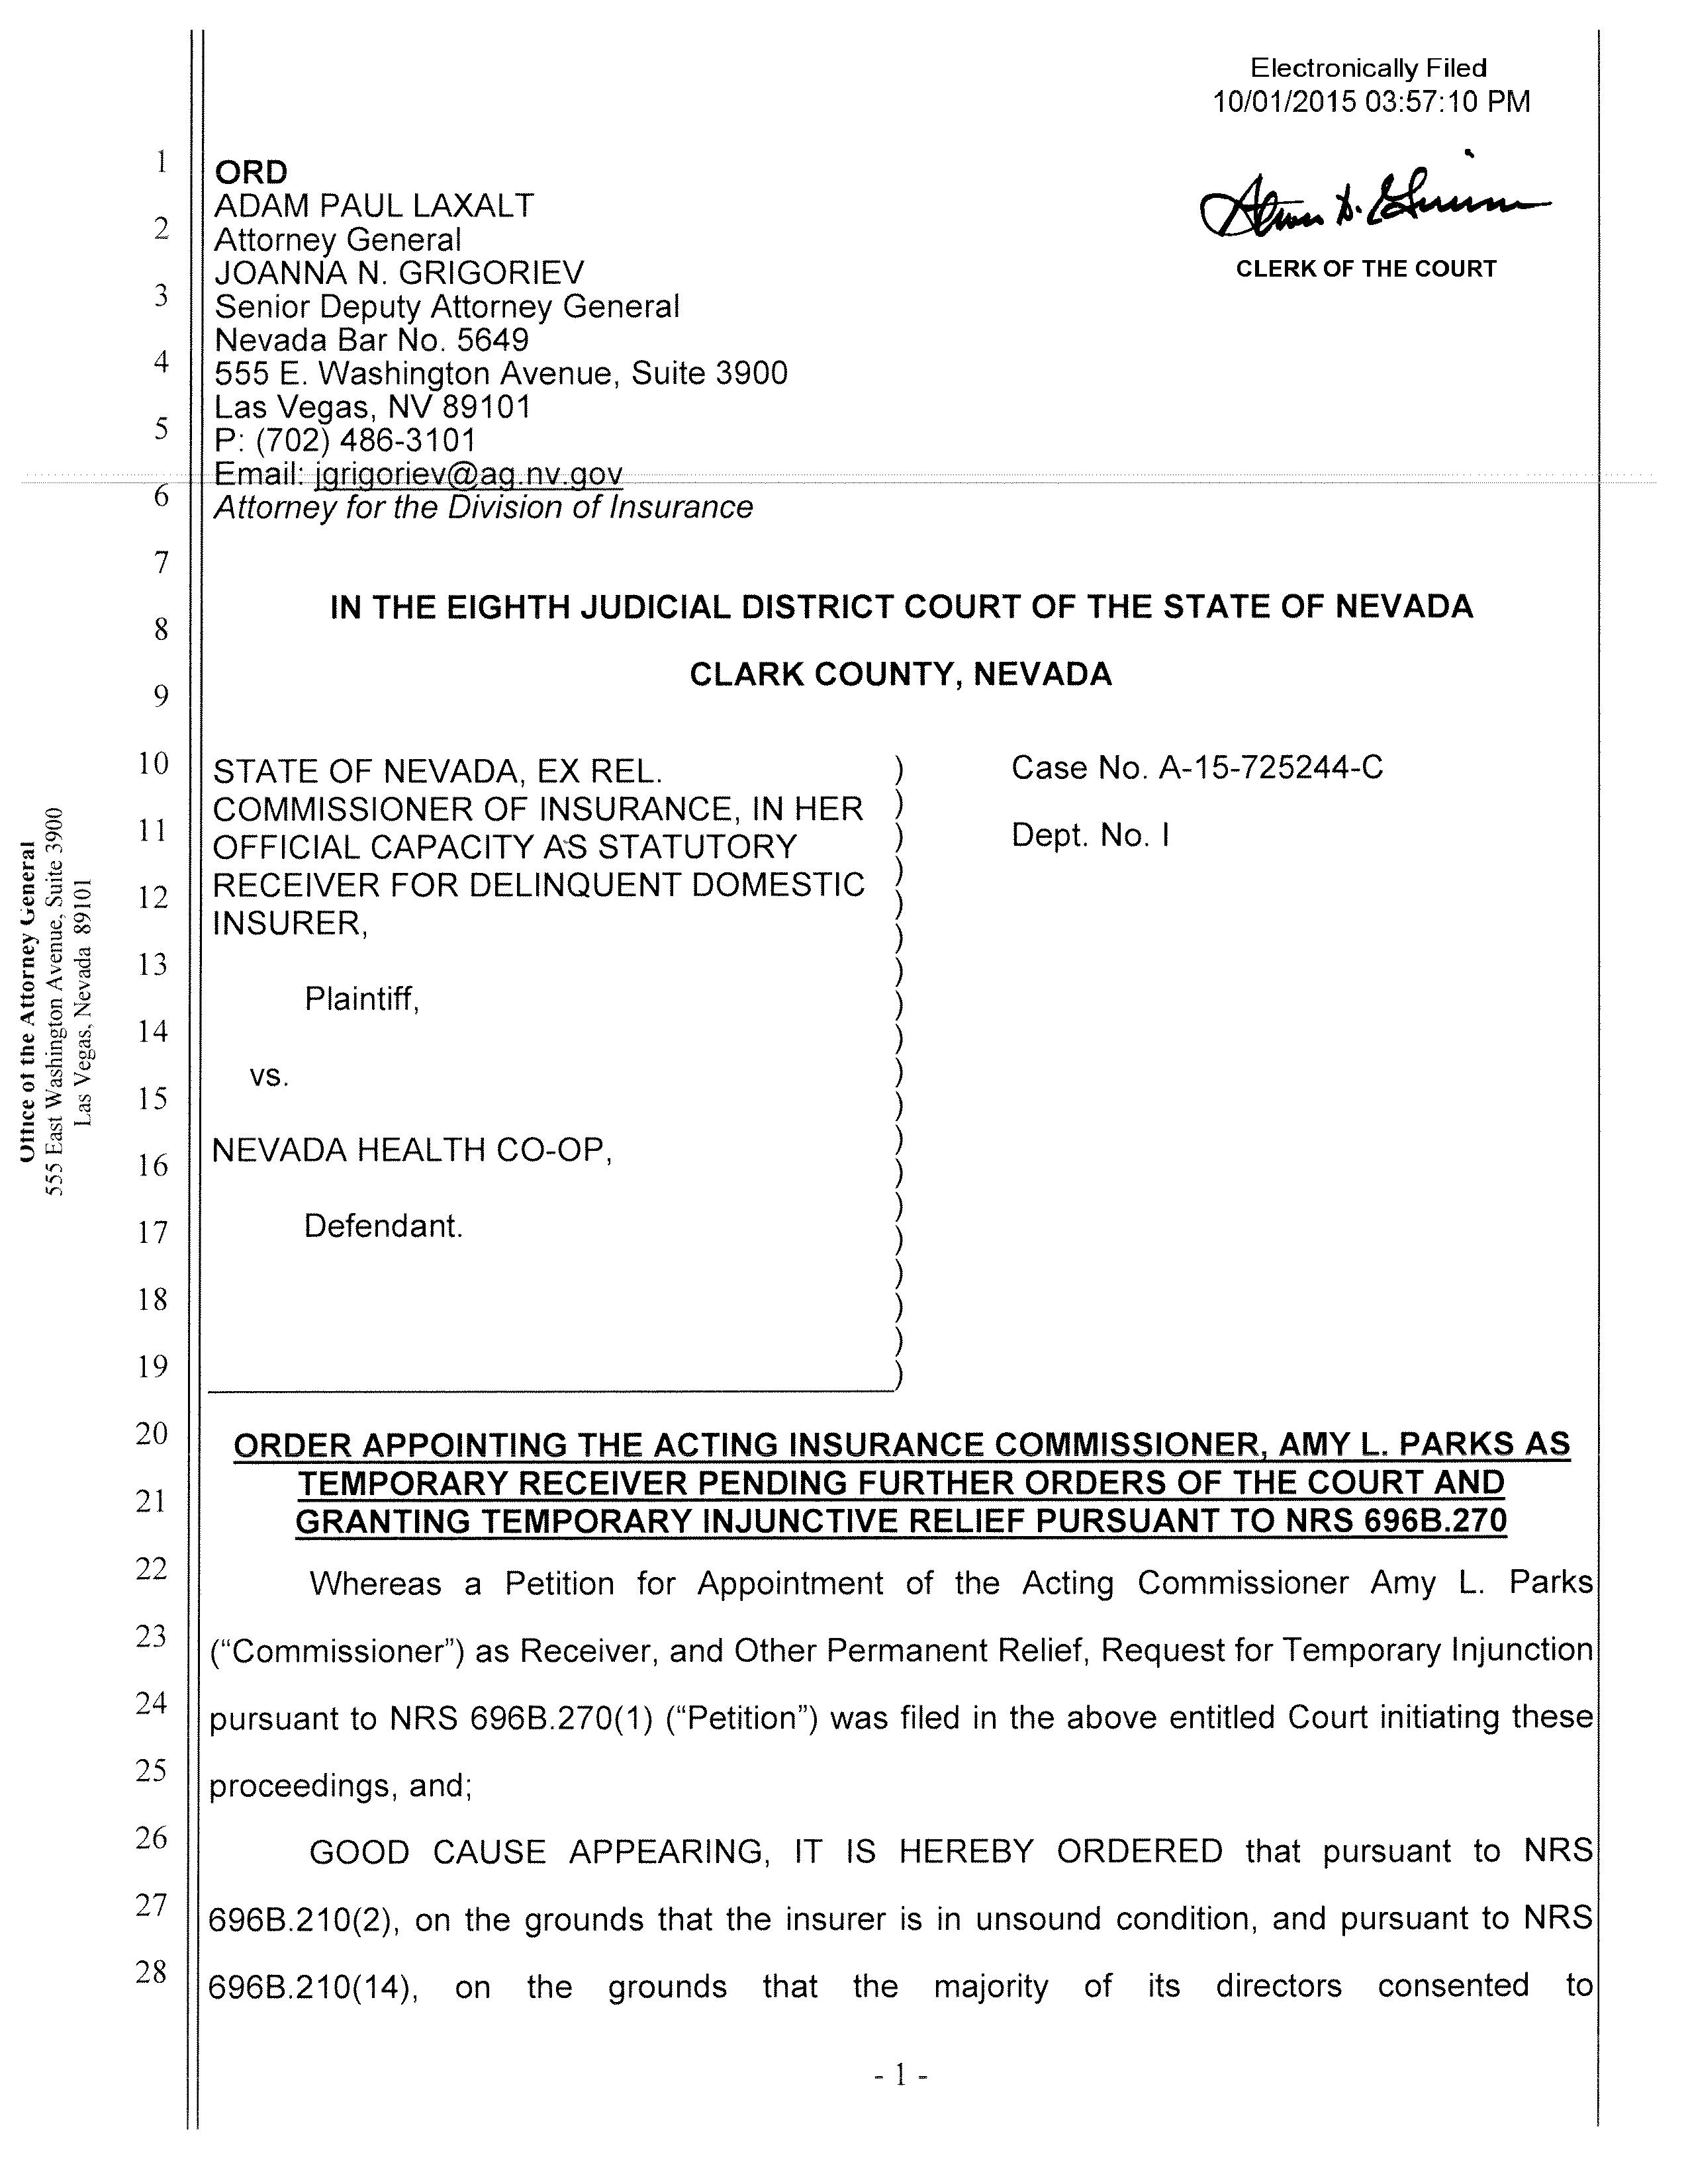 Nevada Health Coop Sued